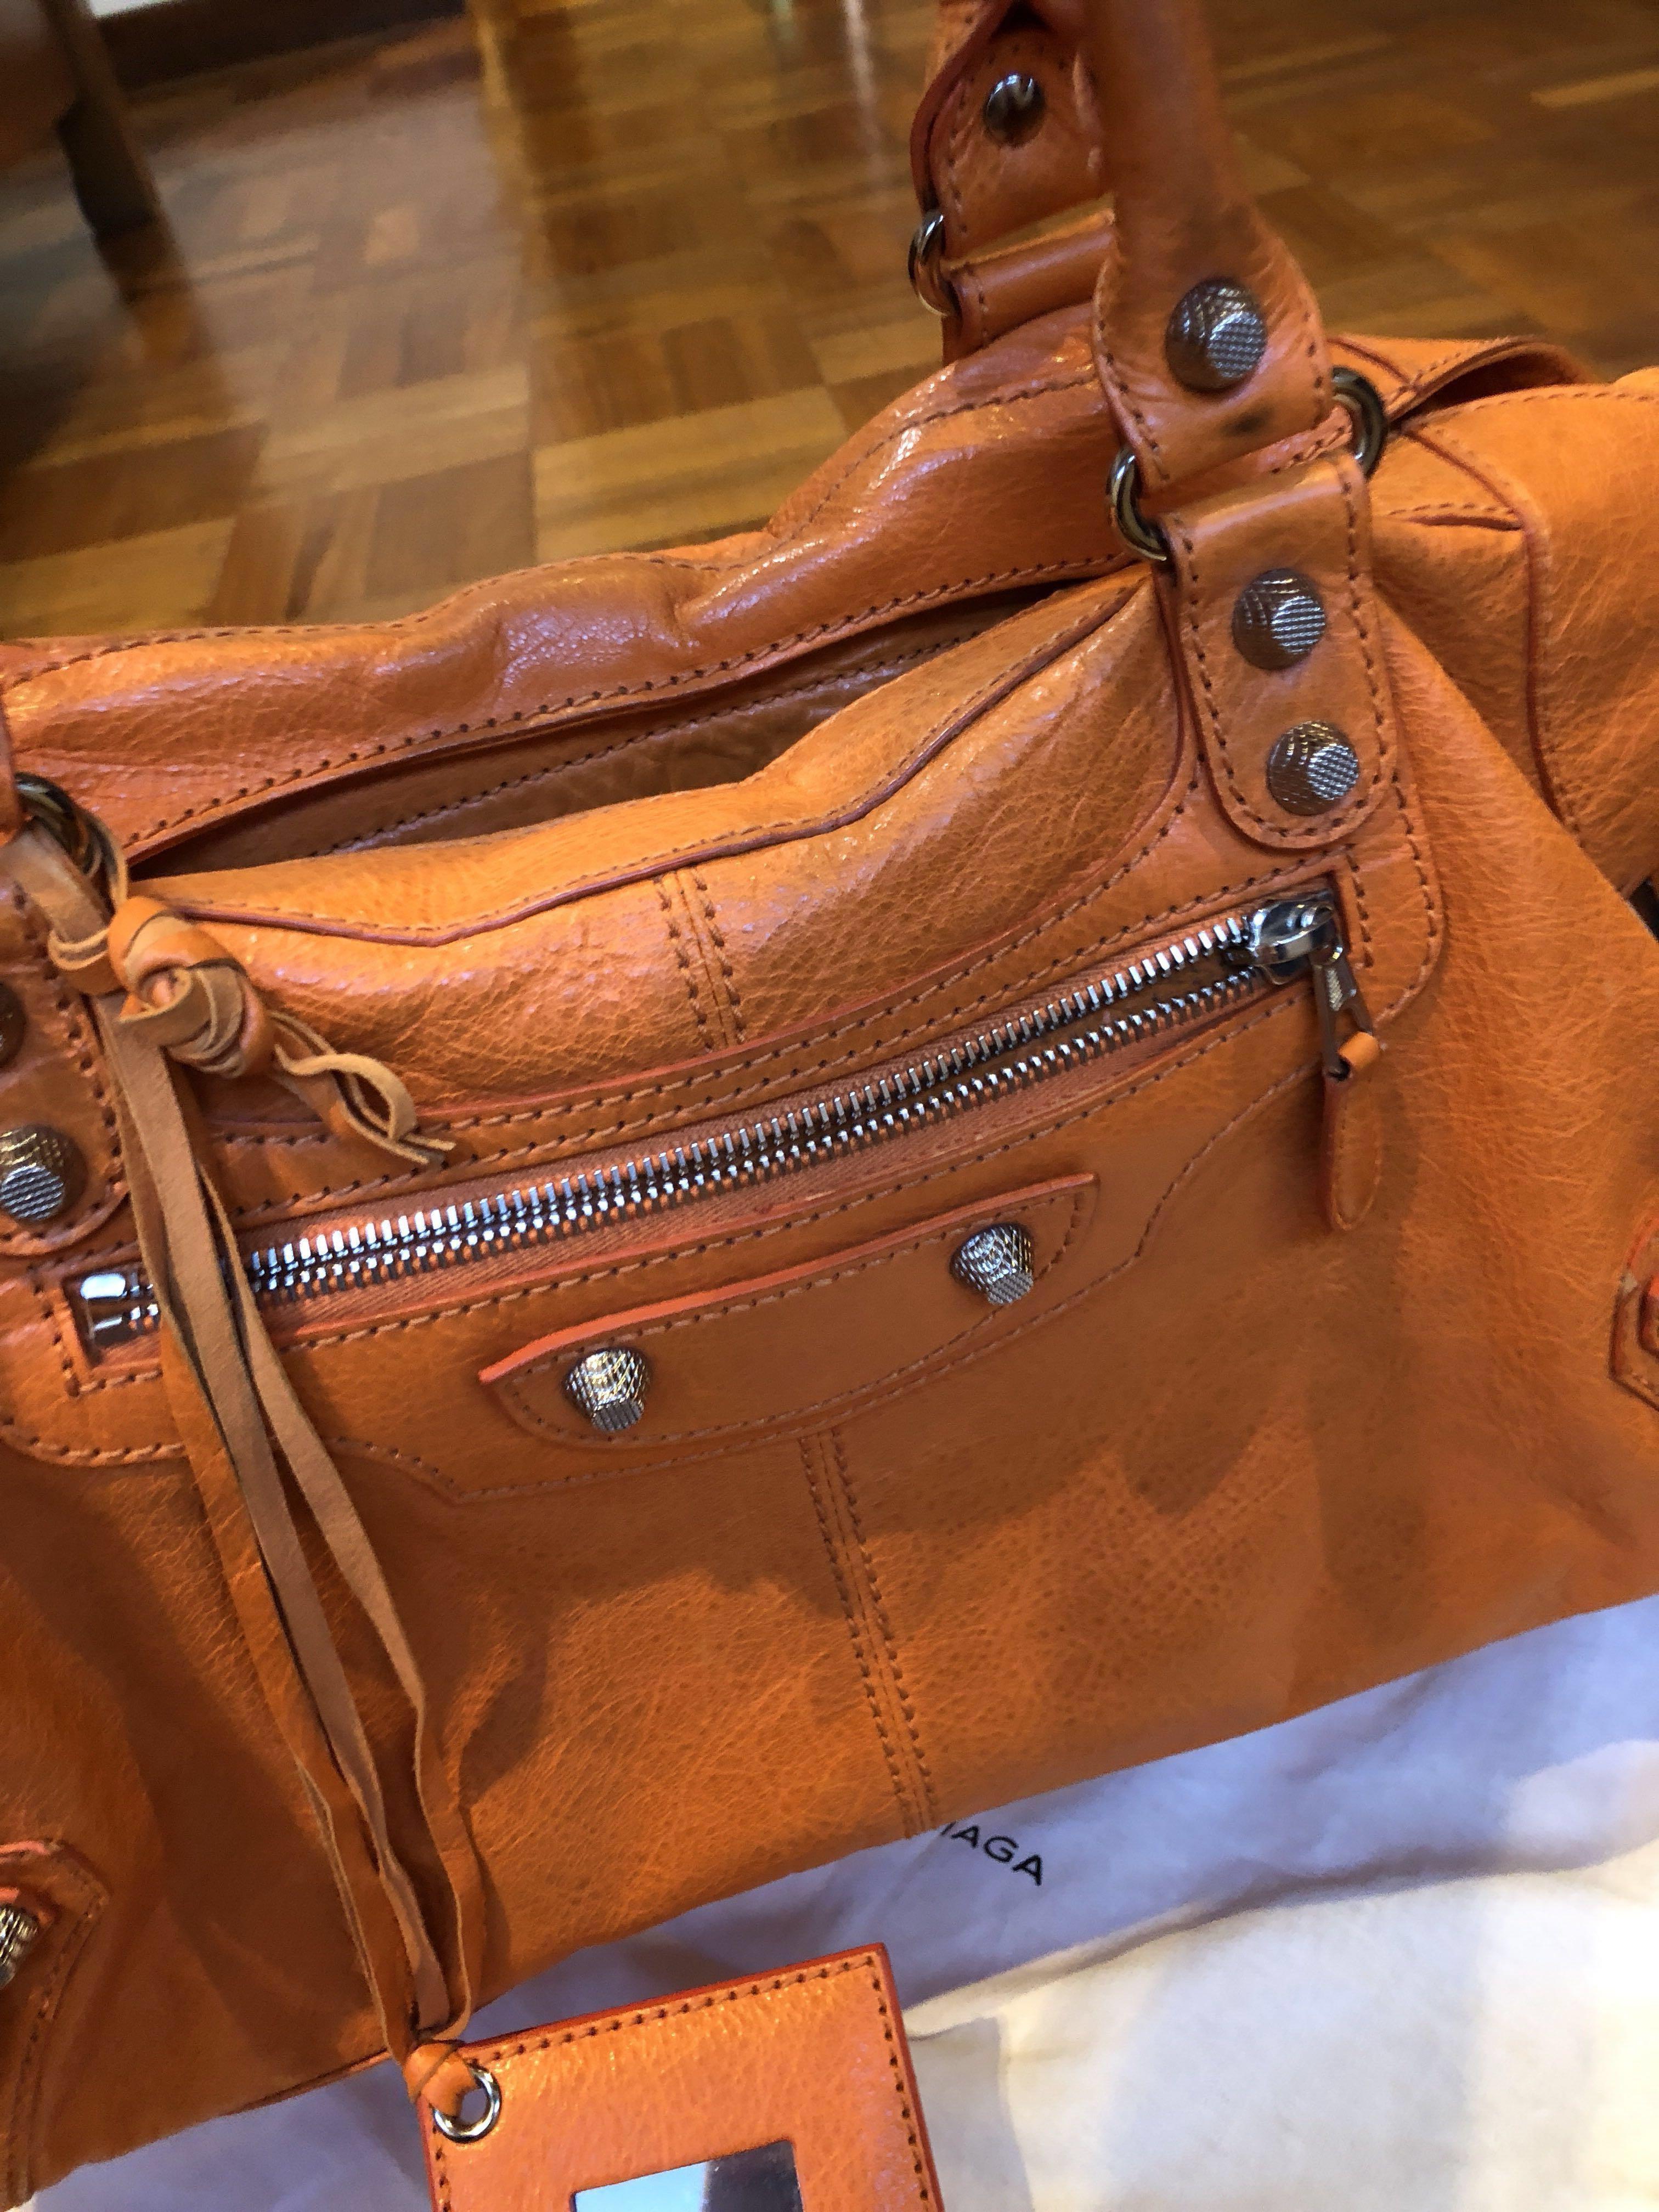 ec66d8b0f7 BALENCIAGA PART TIME G21 SHW (DISCONTINUED), Luxury, Bags & Wallets ...